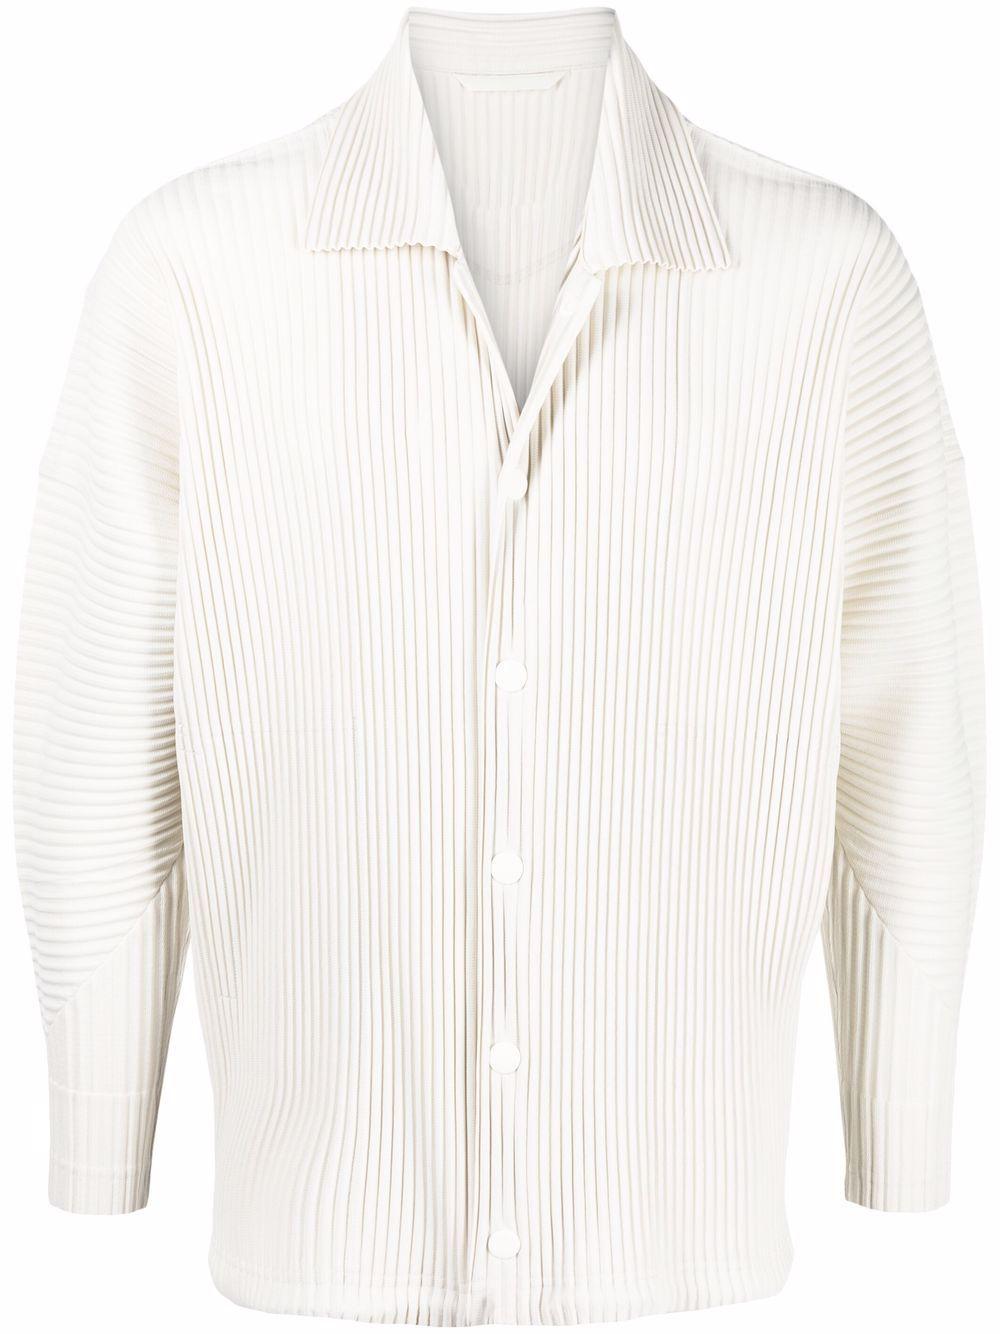 HOMME PLISSE | Jacket | HP18JC11103